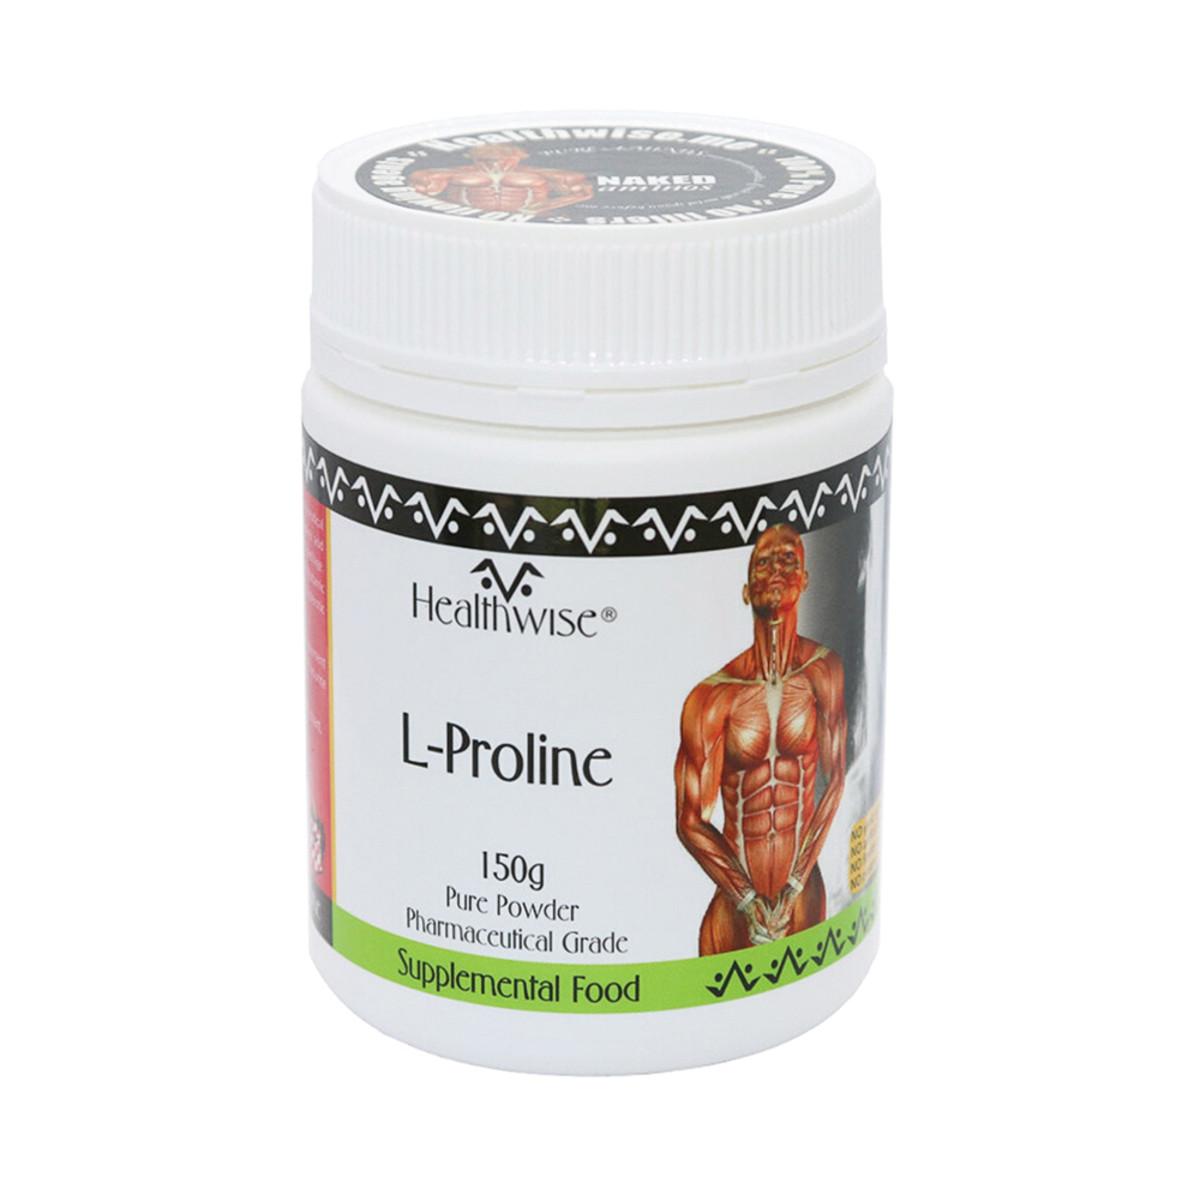 HEALTHWISE L-PROLINE 150G